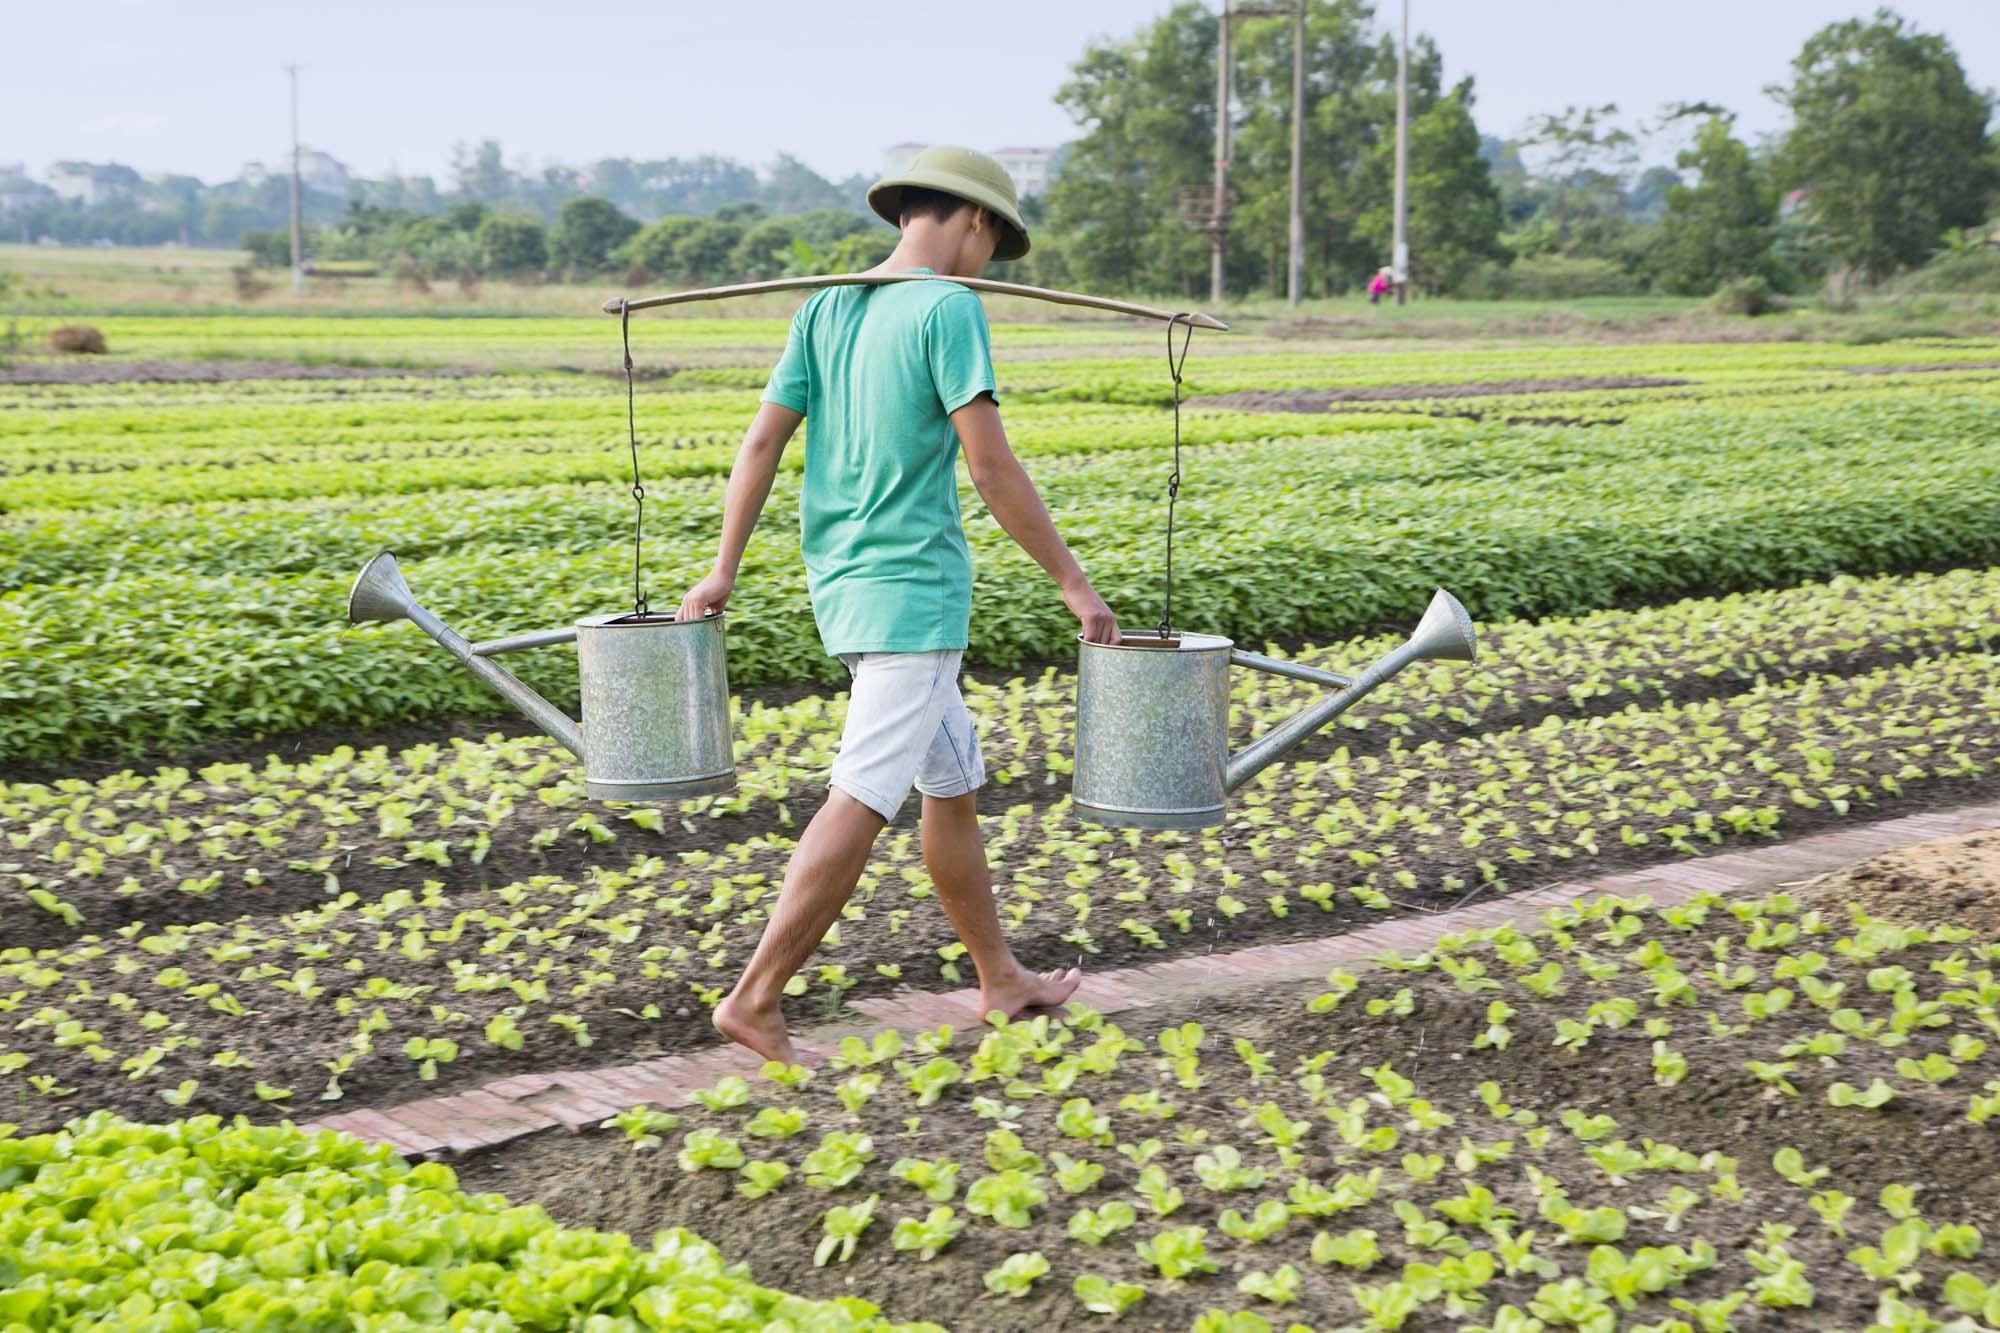 Asien, Vietnam, Hoi An, Landwirtschaft, Gärten